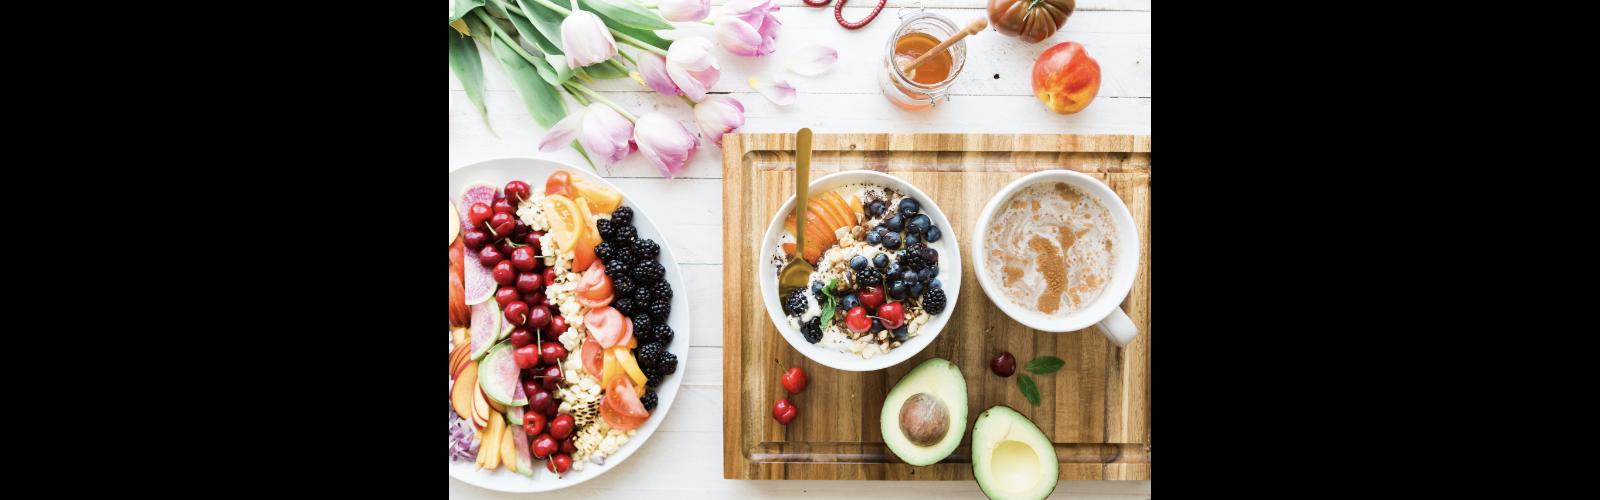 Health & Wellness Organic Whole Foods Nutrition